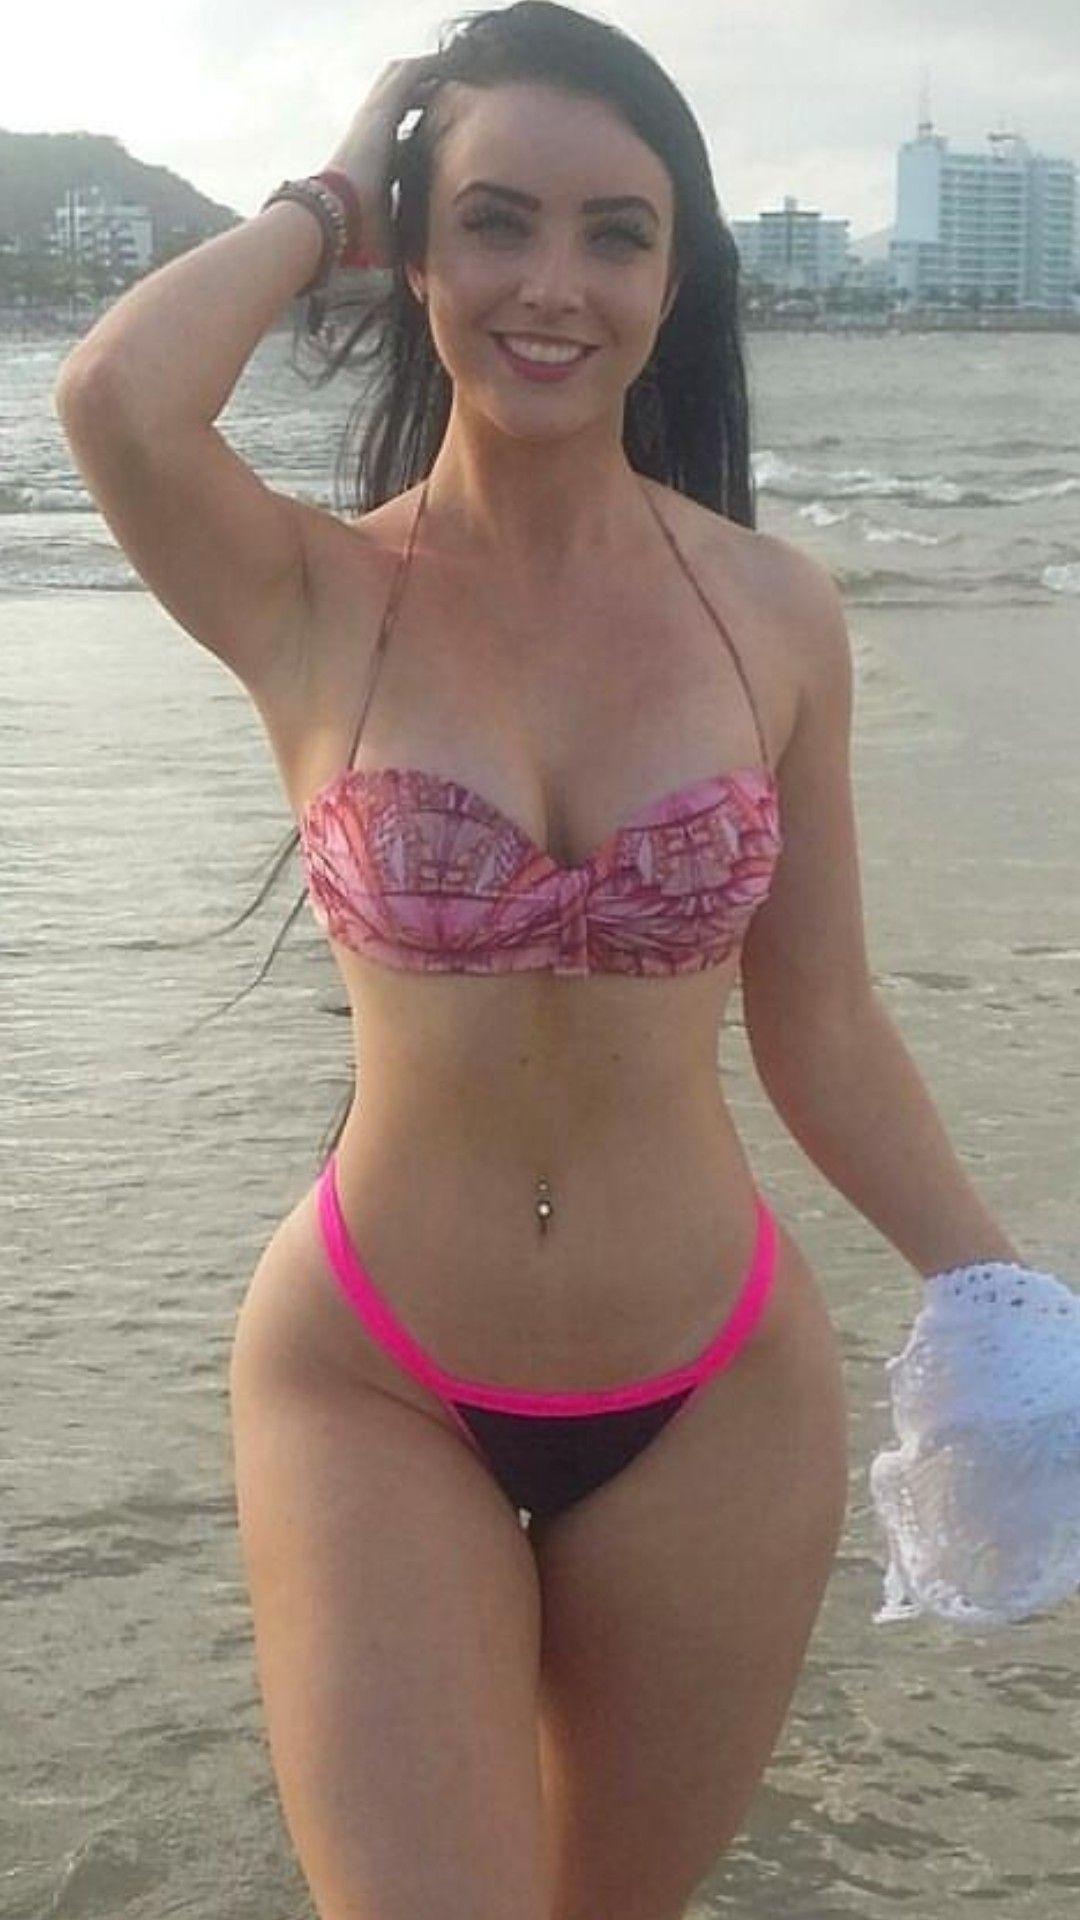 Swimwear Swimsuits Bikinis Types Of Women Bathing Beauties Sexy Ebony